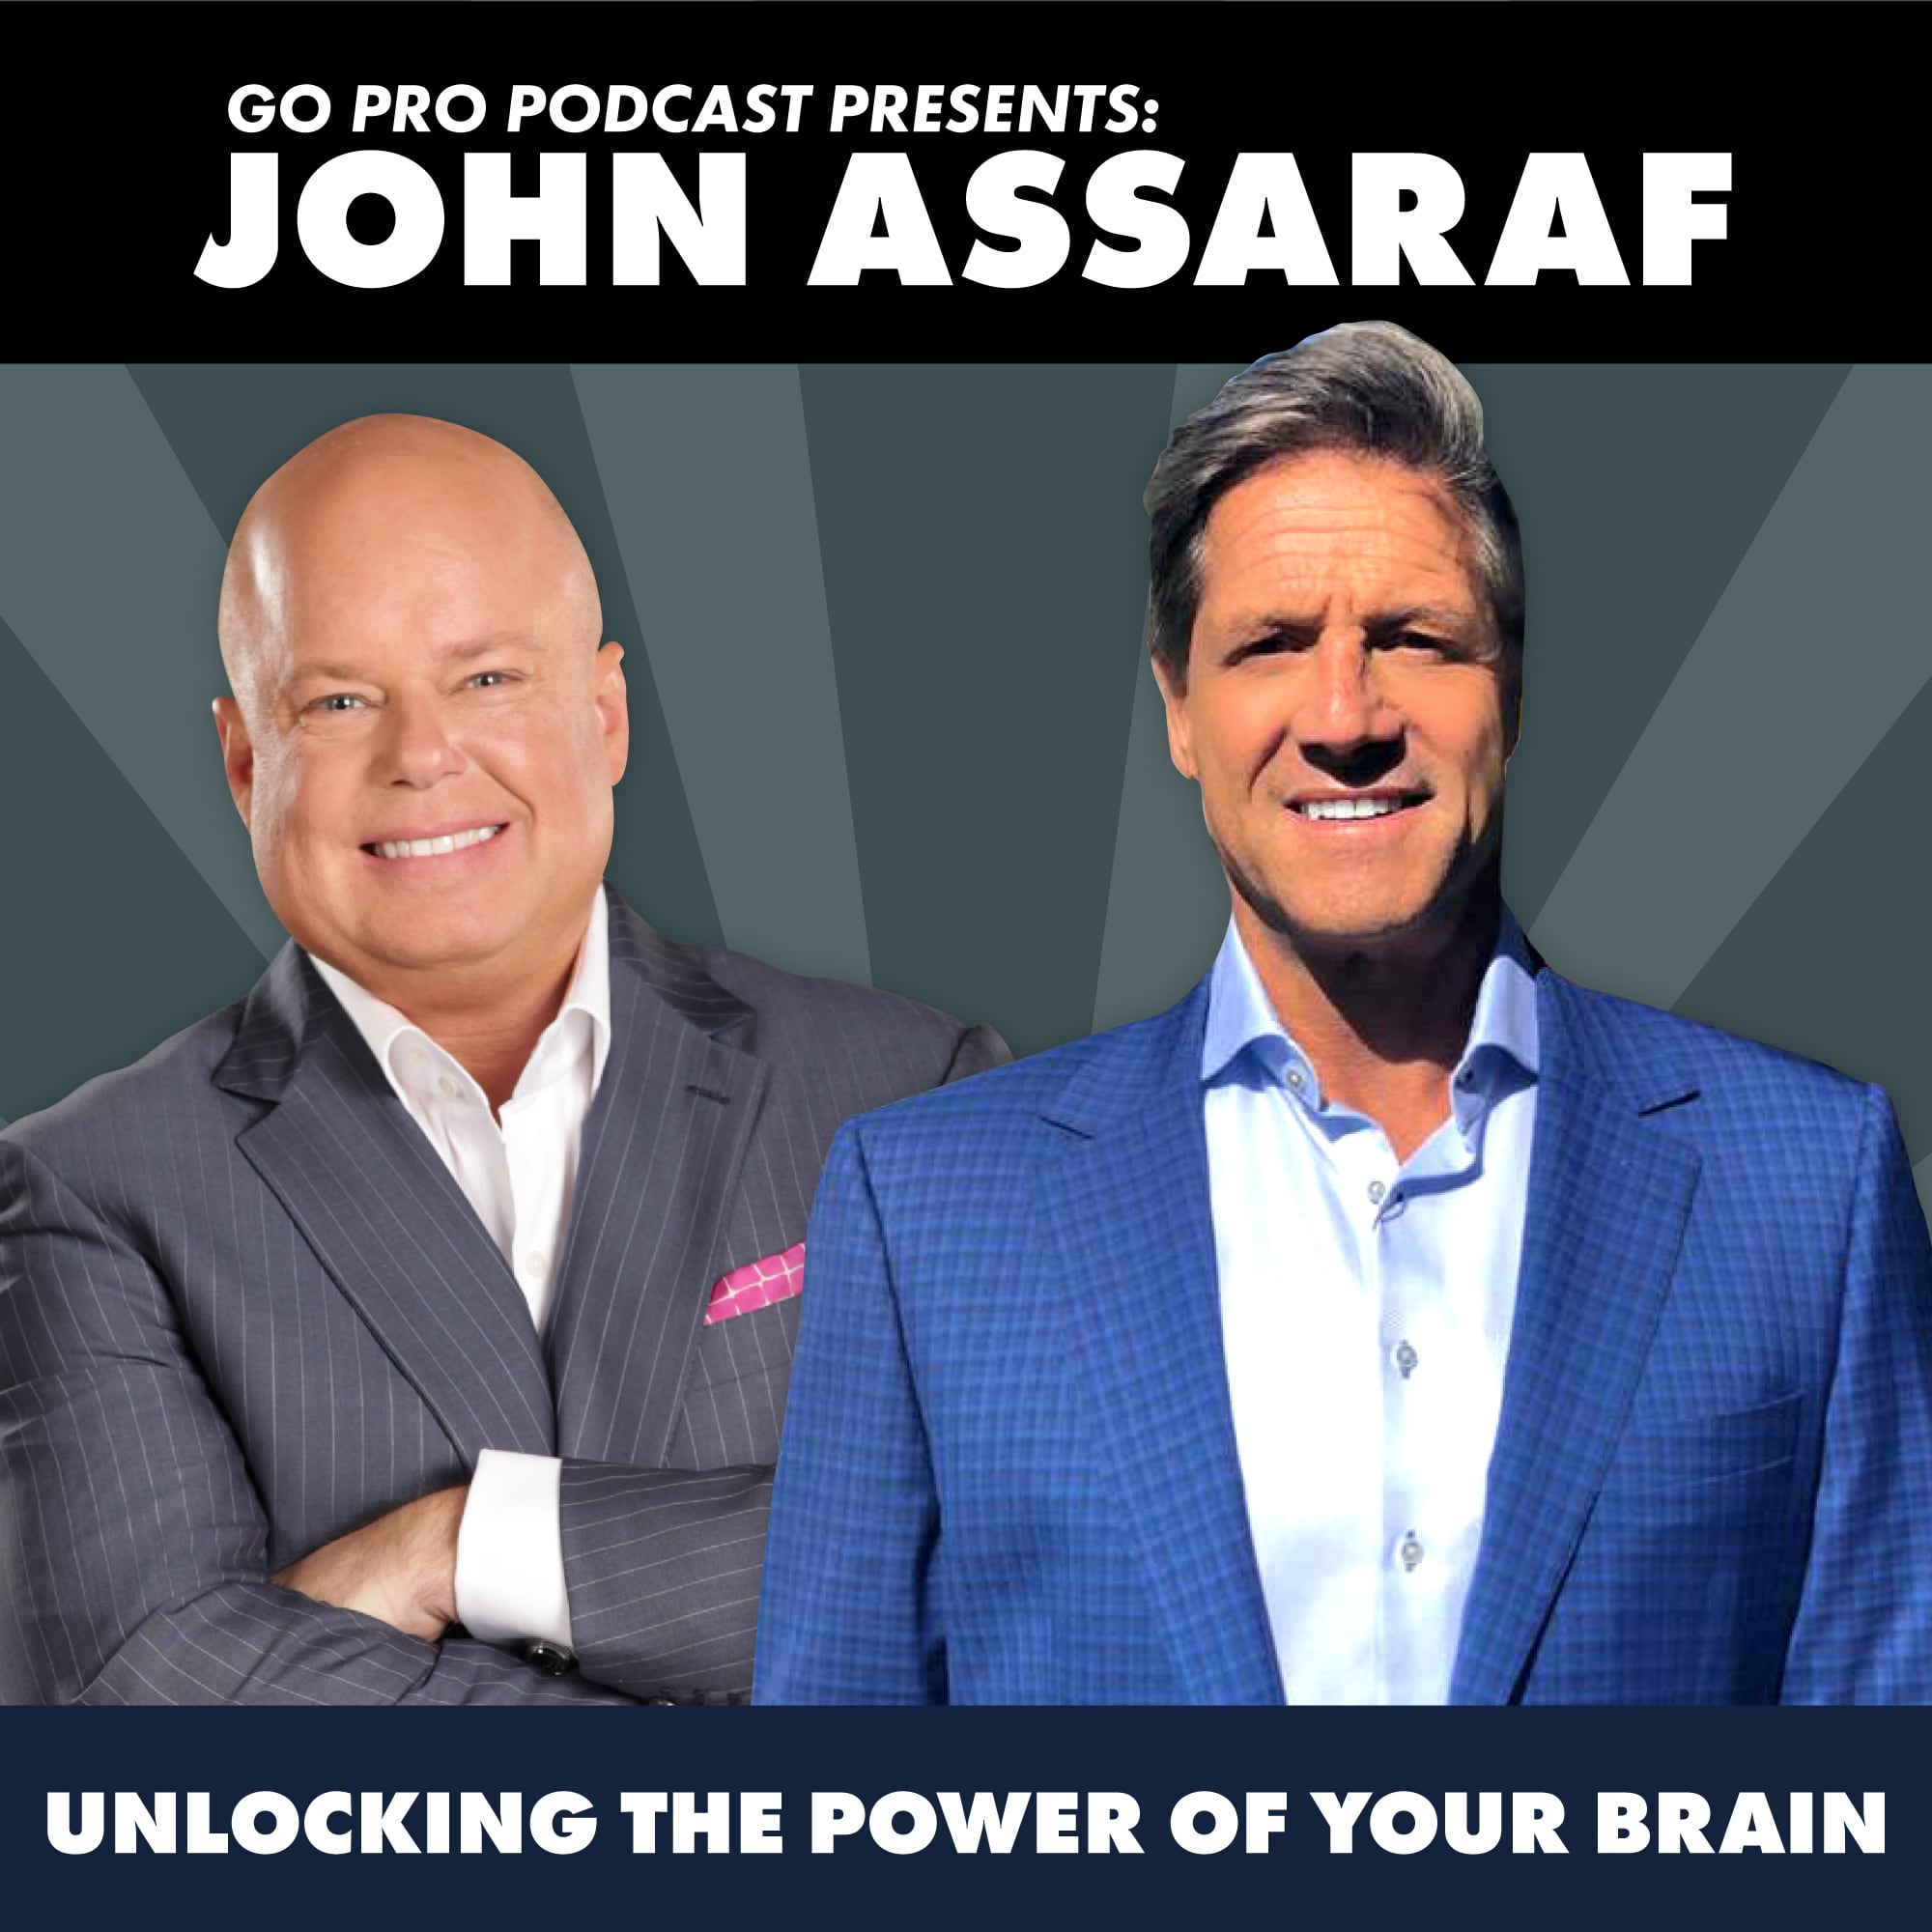 John Assaraf: Unlocking the Power of Your Brain